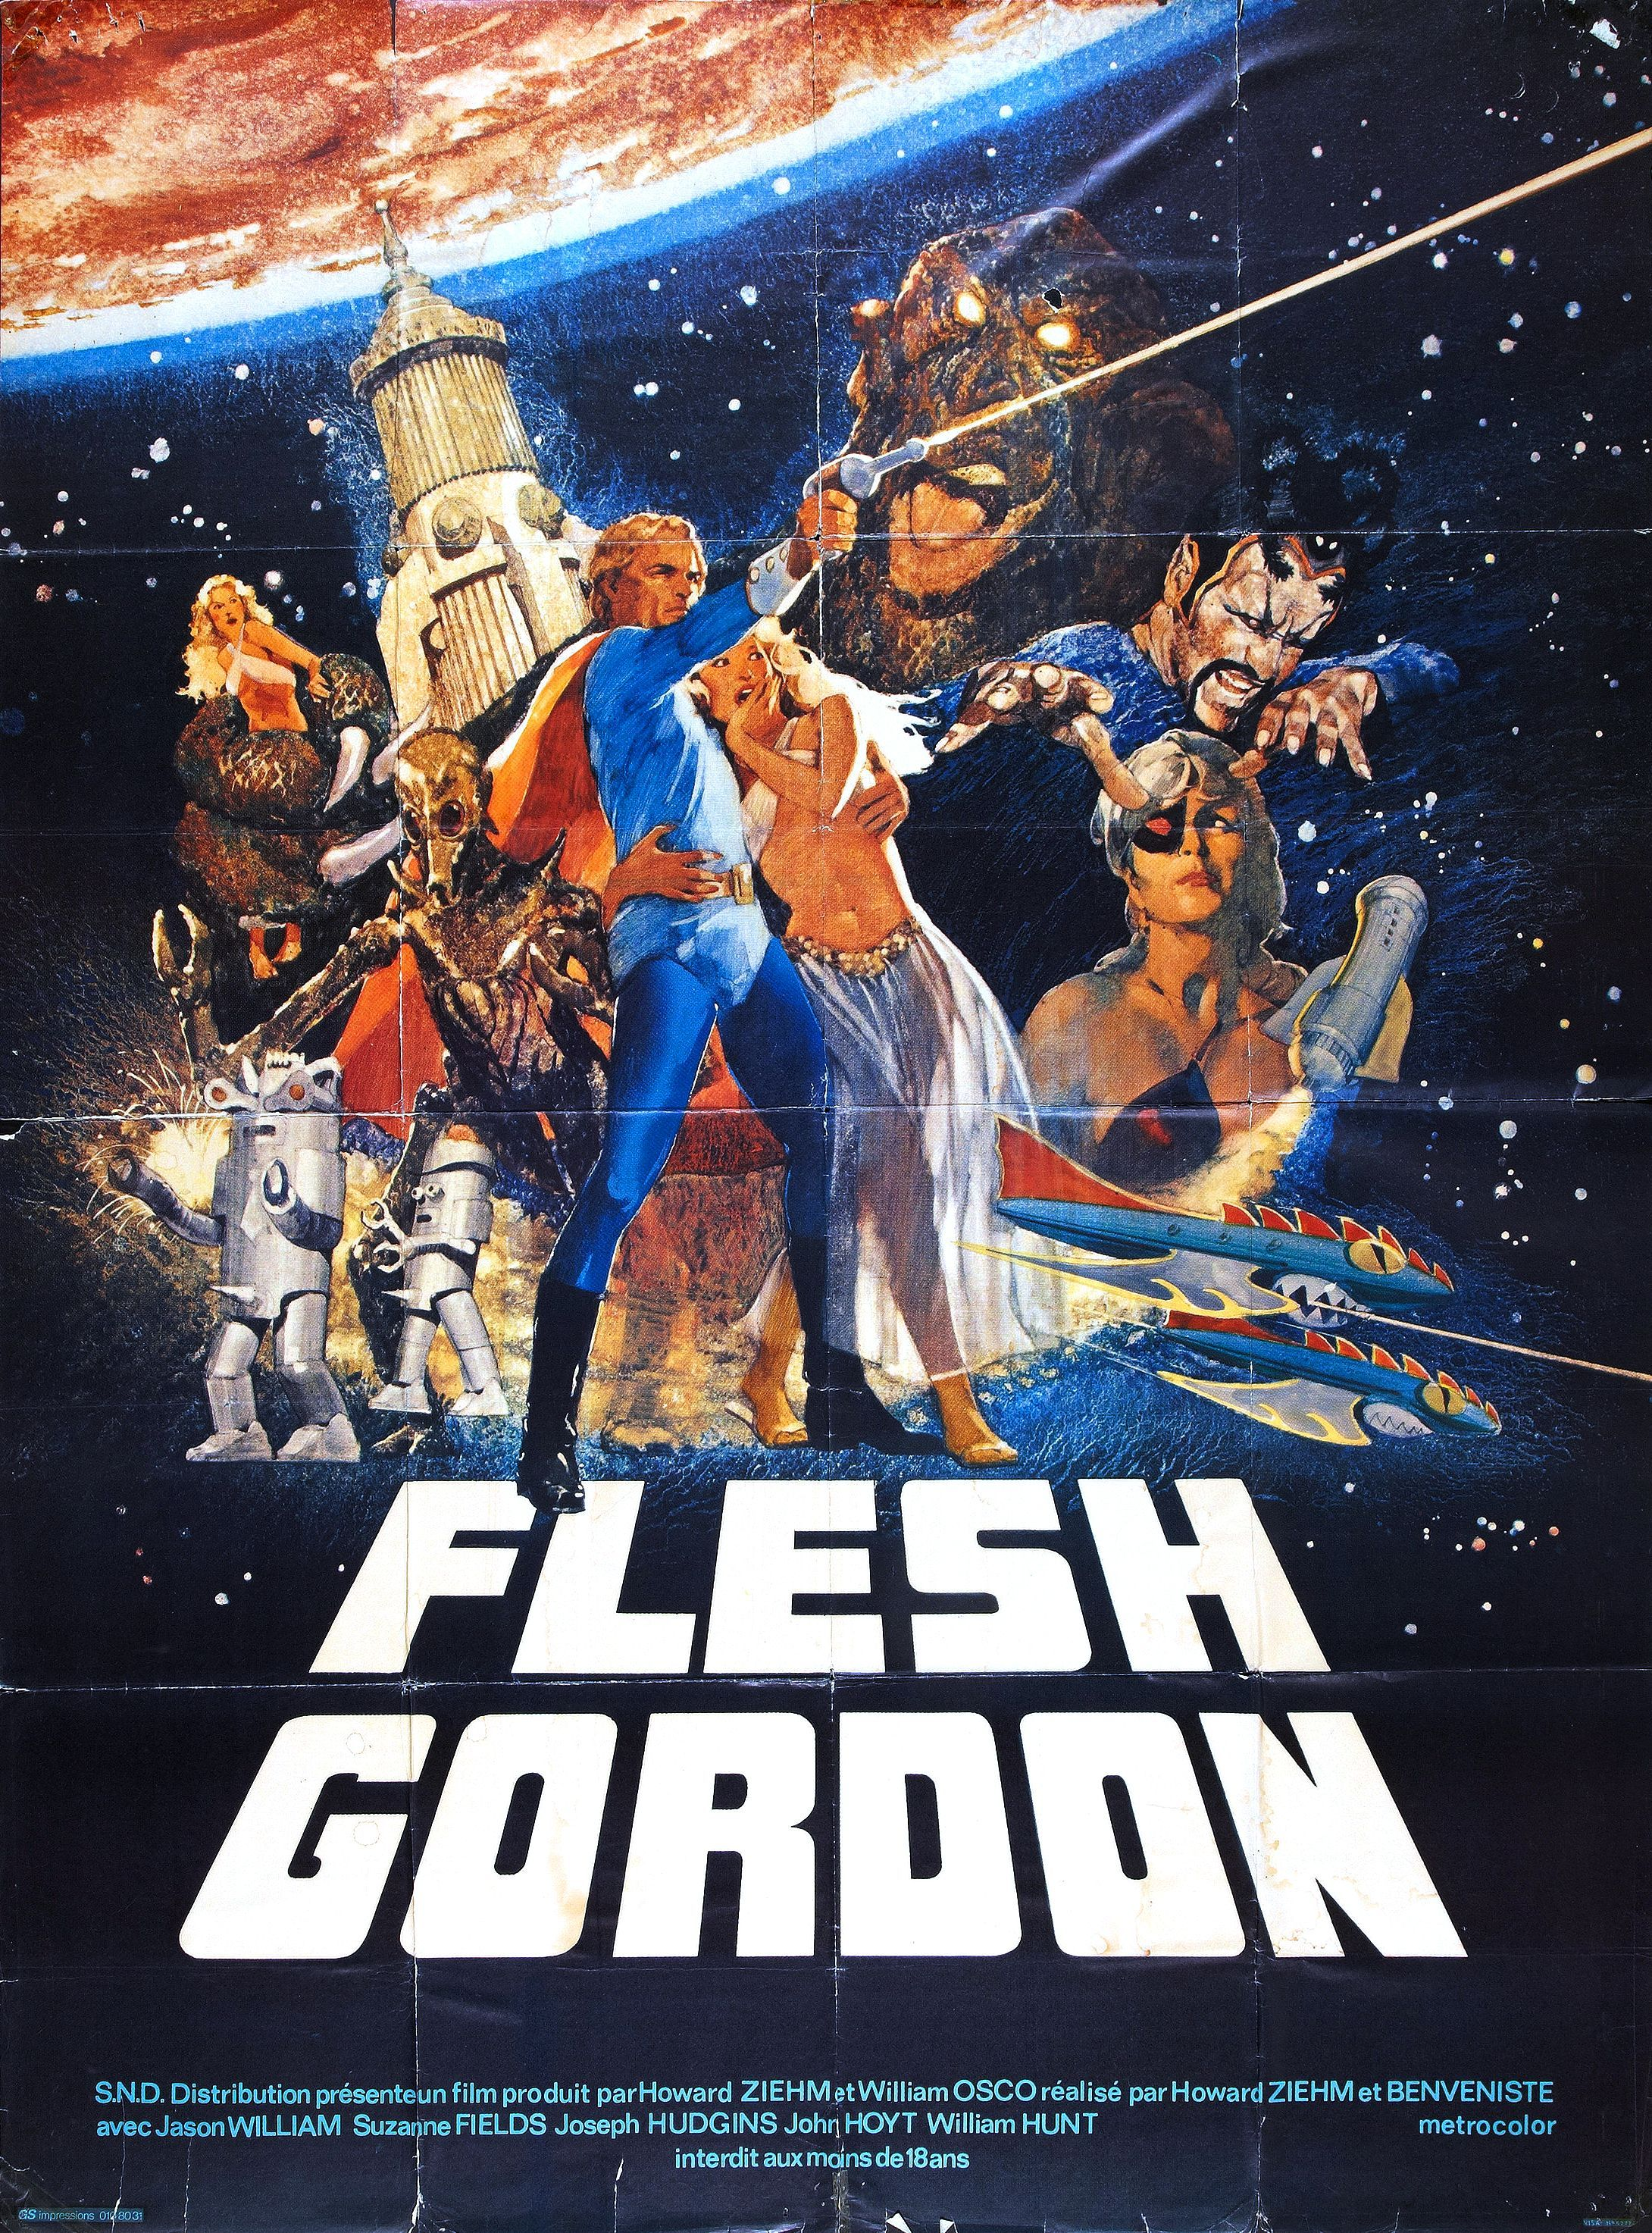 Flesh Gordon 1974 Movie Posters B Movie Film Posters